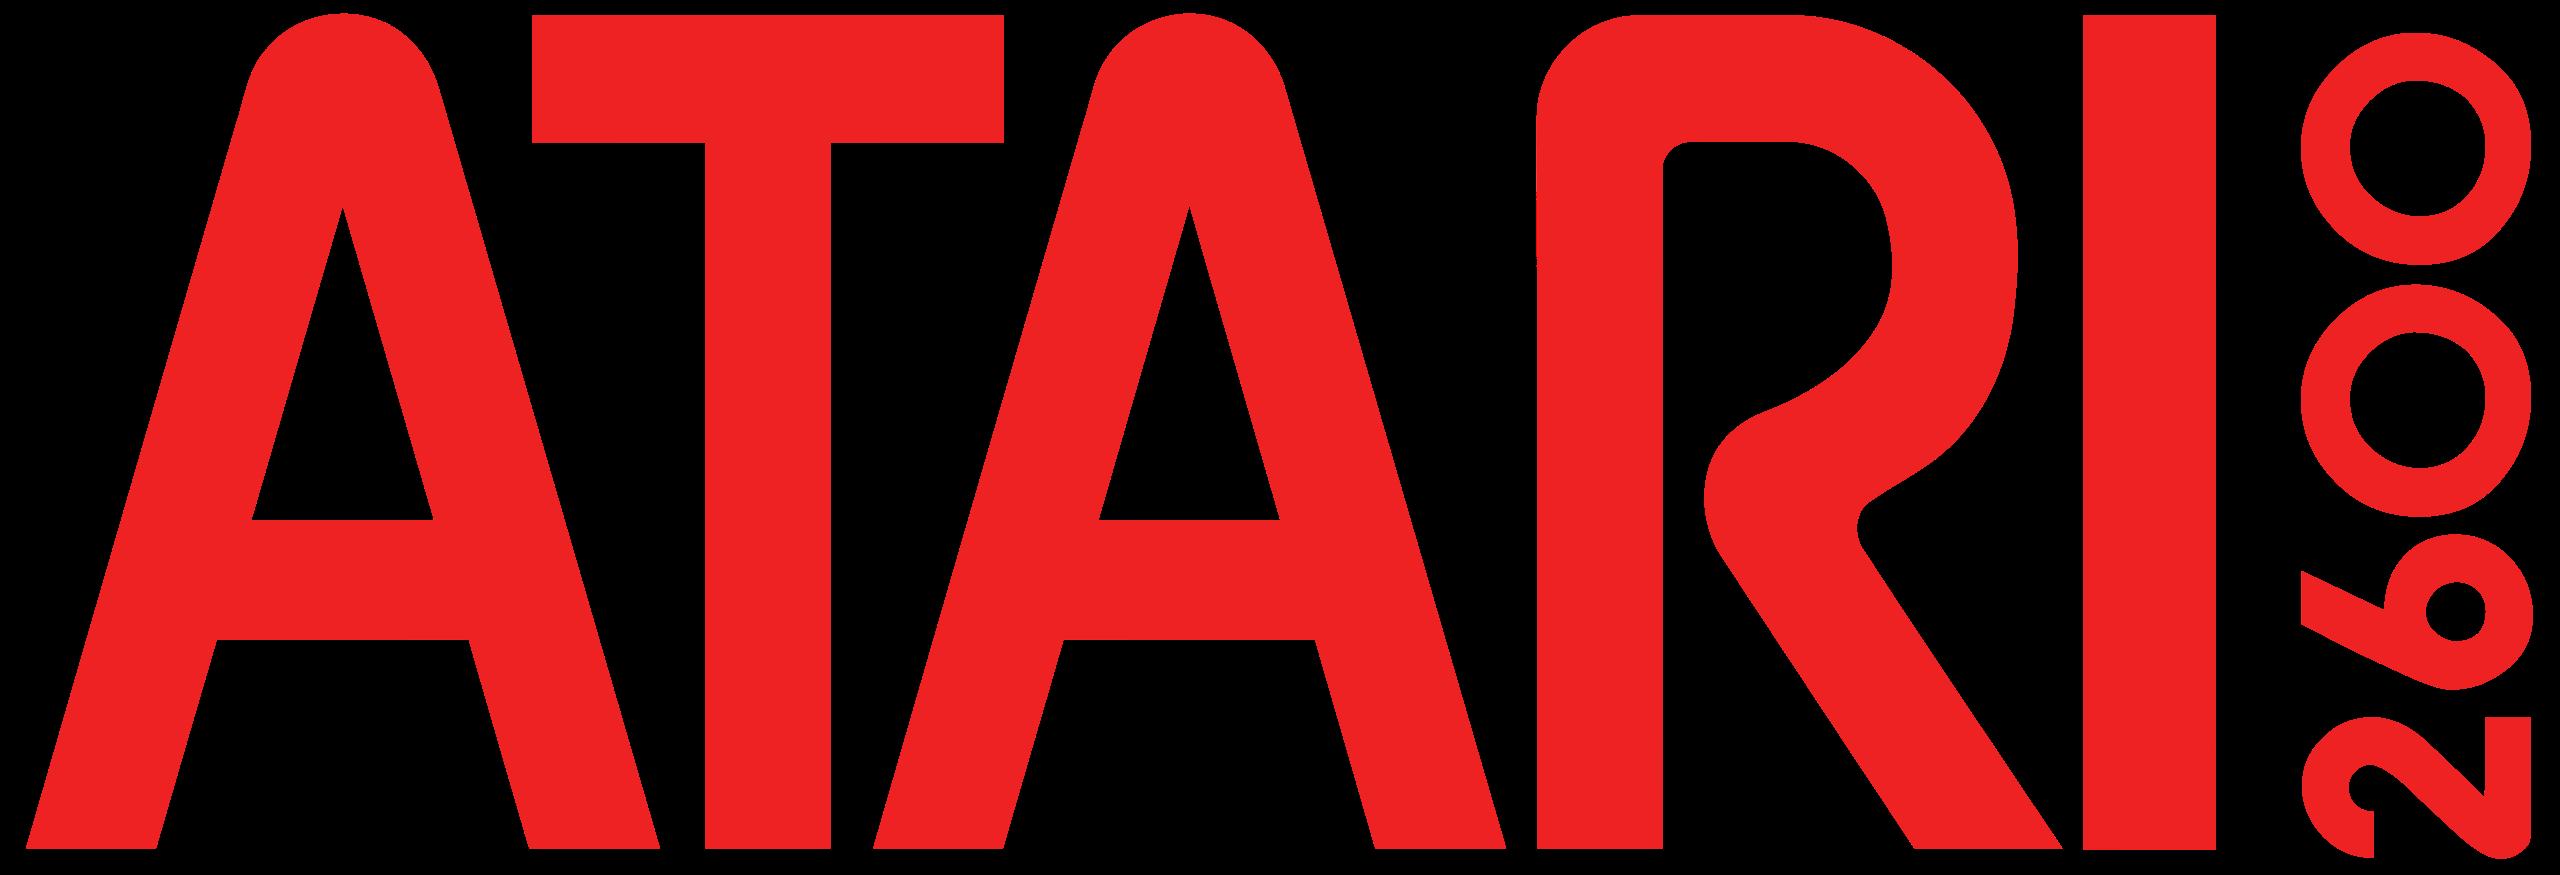 File Atari 2600 Logo Png Wikimedia Commons